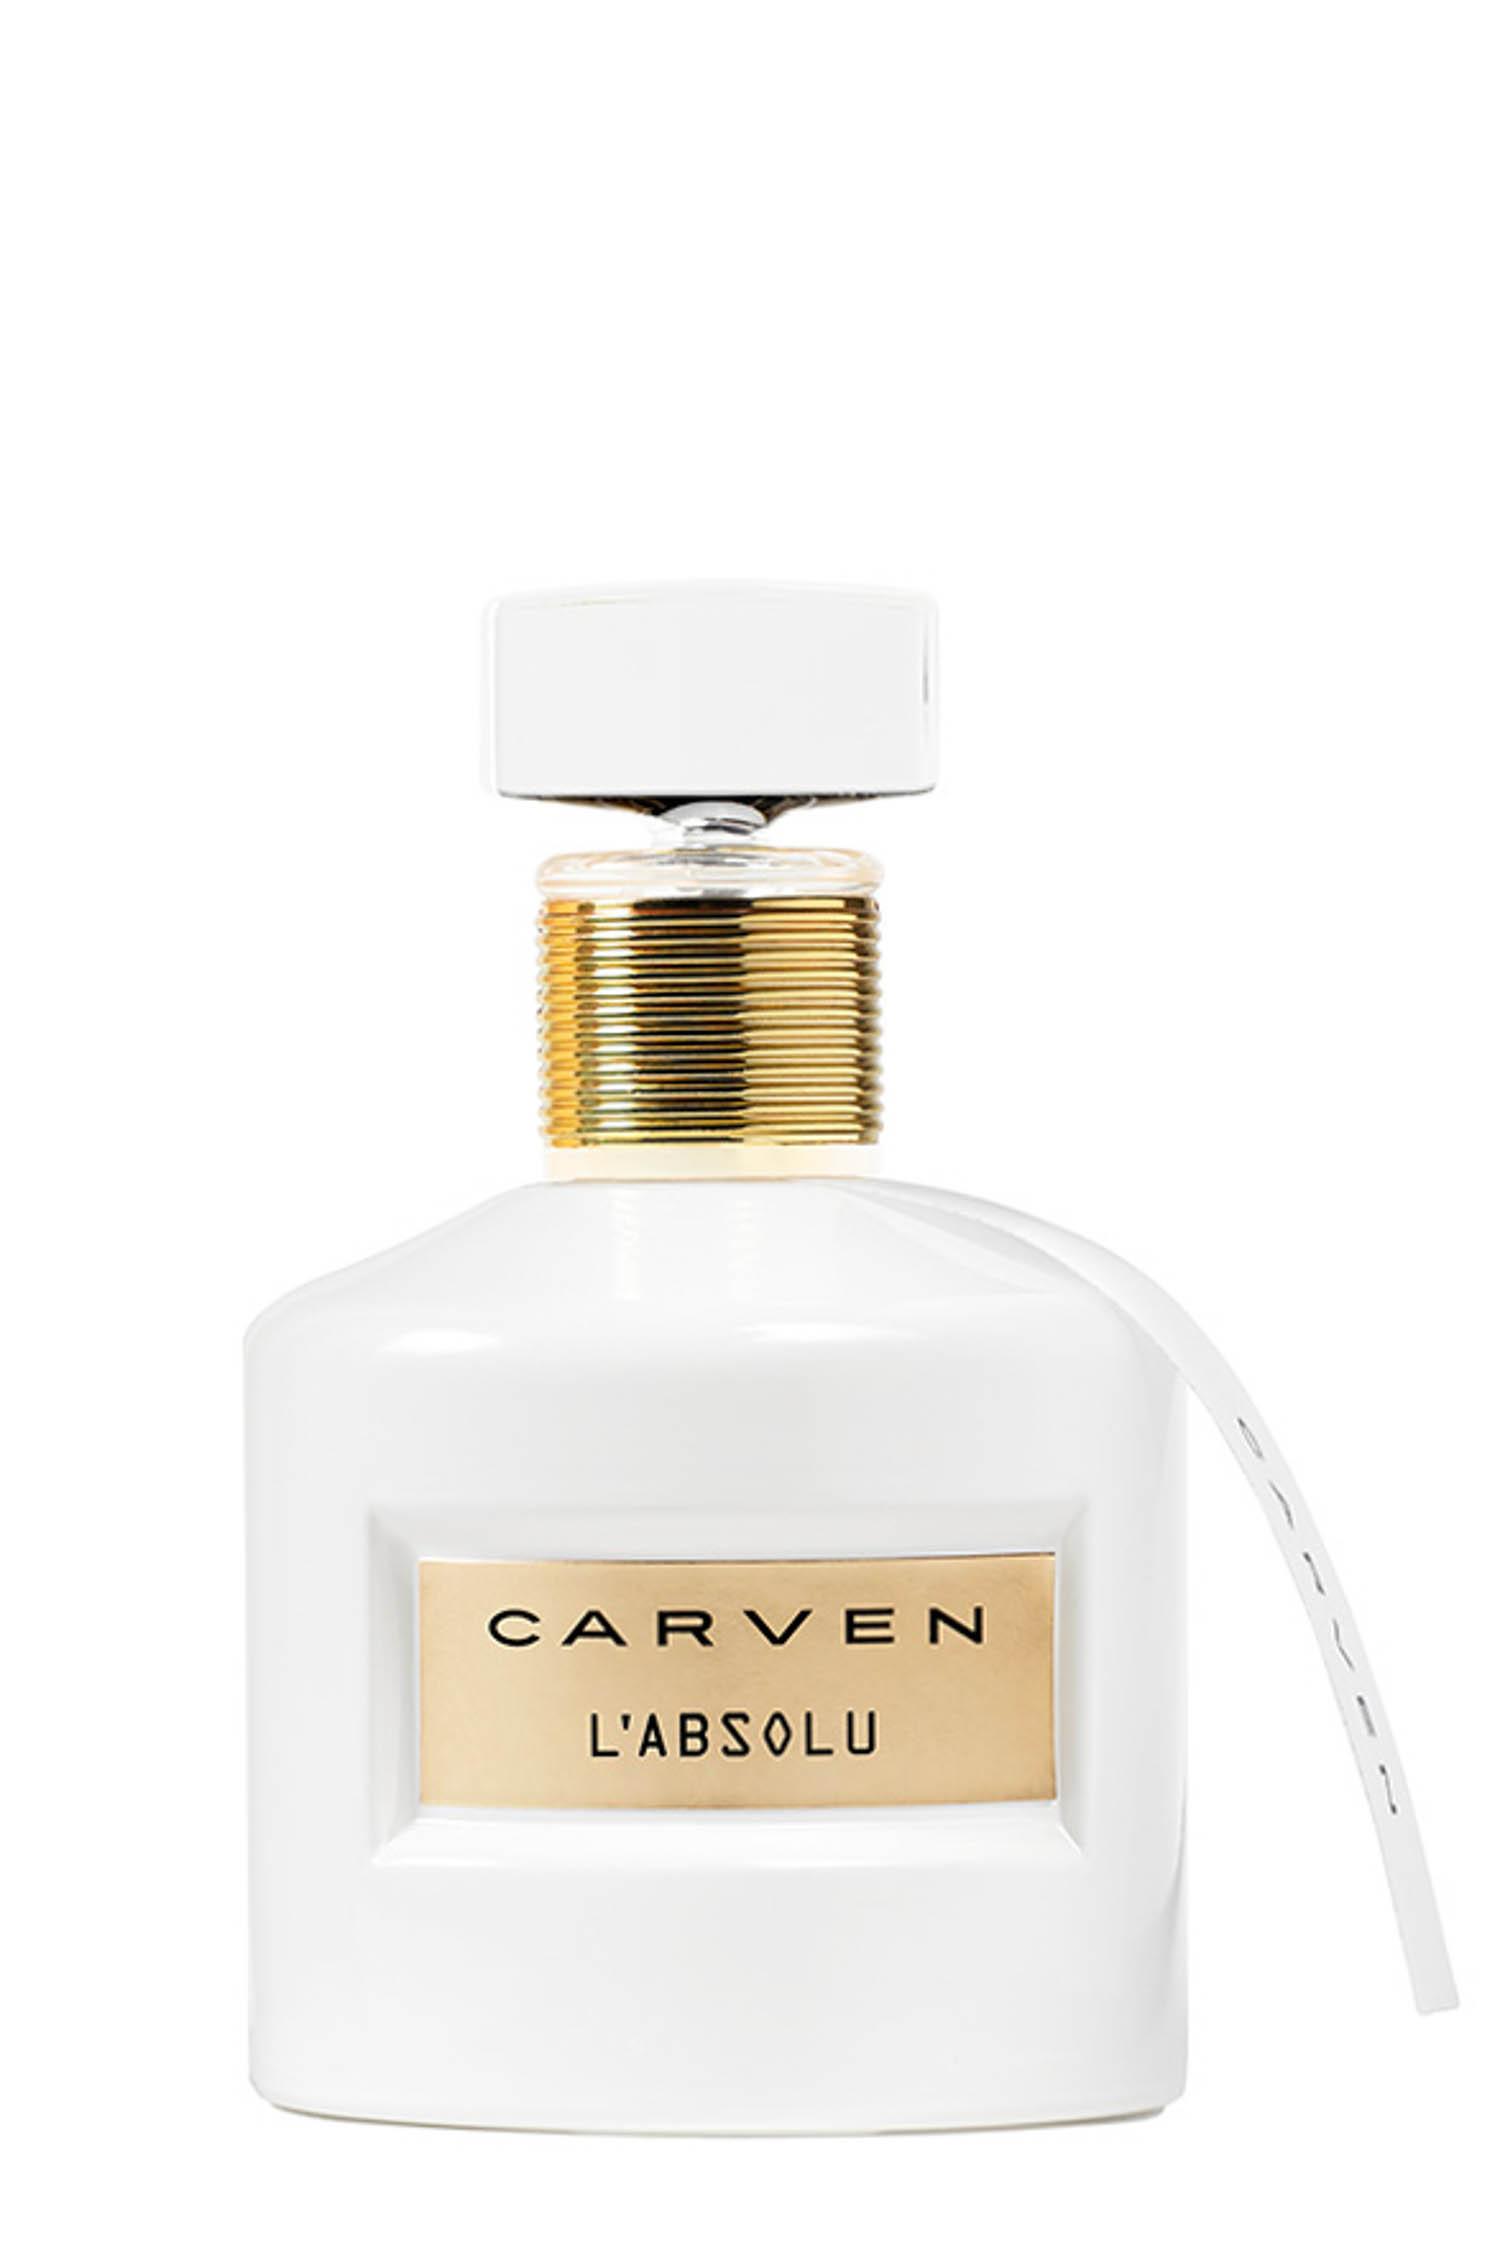 100 Parfum De L'absolu Ml Carven Bvyf6gy7 Eau wO8nk0P